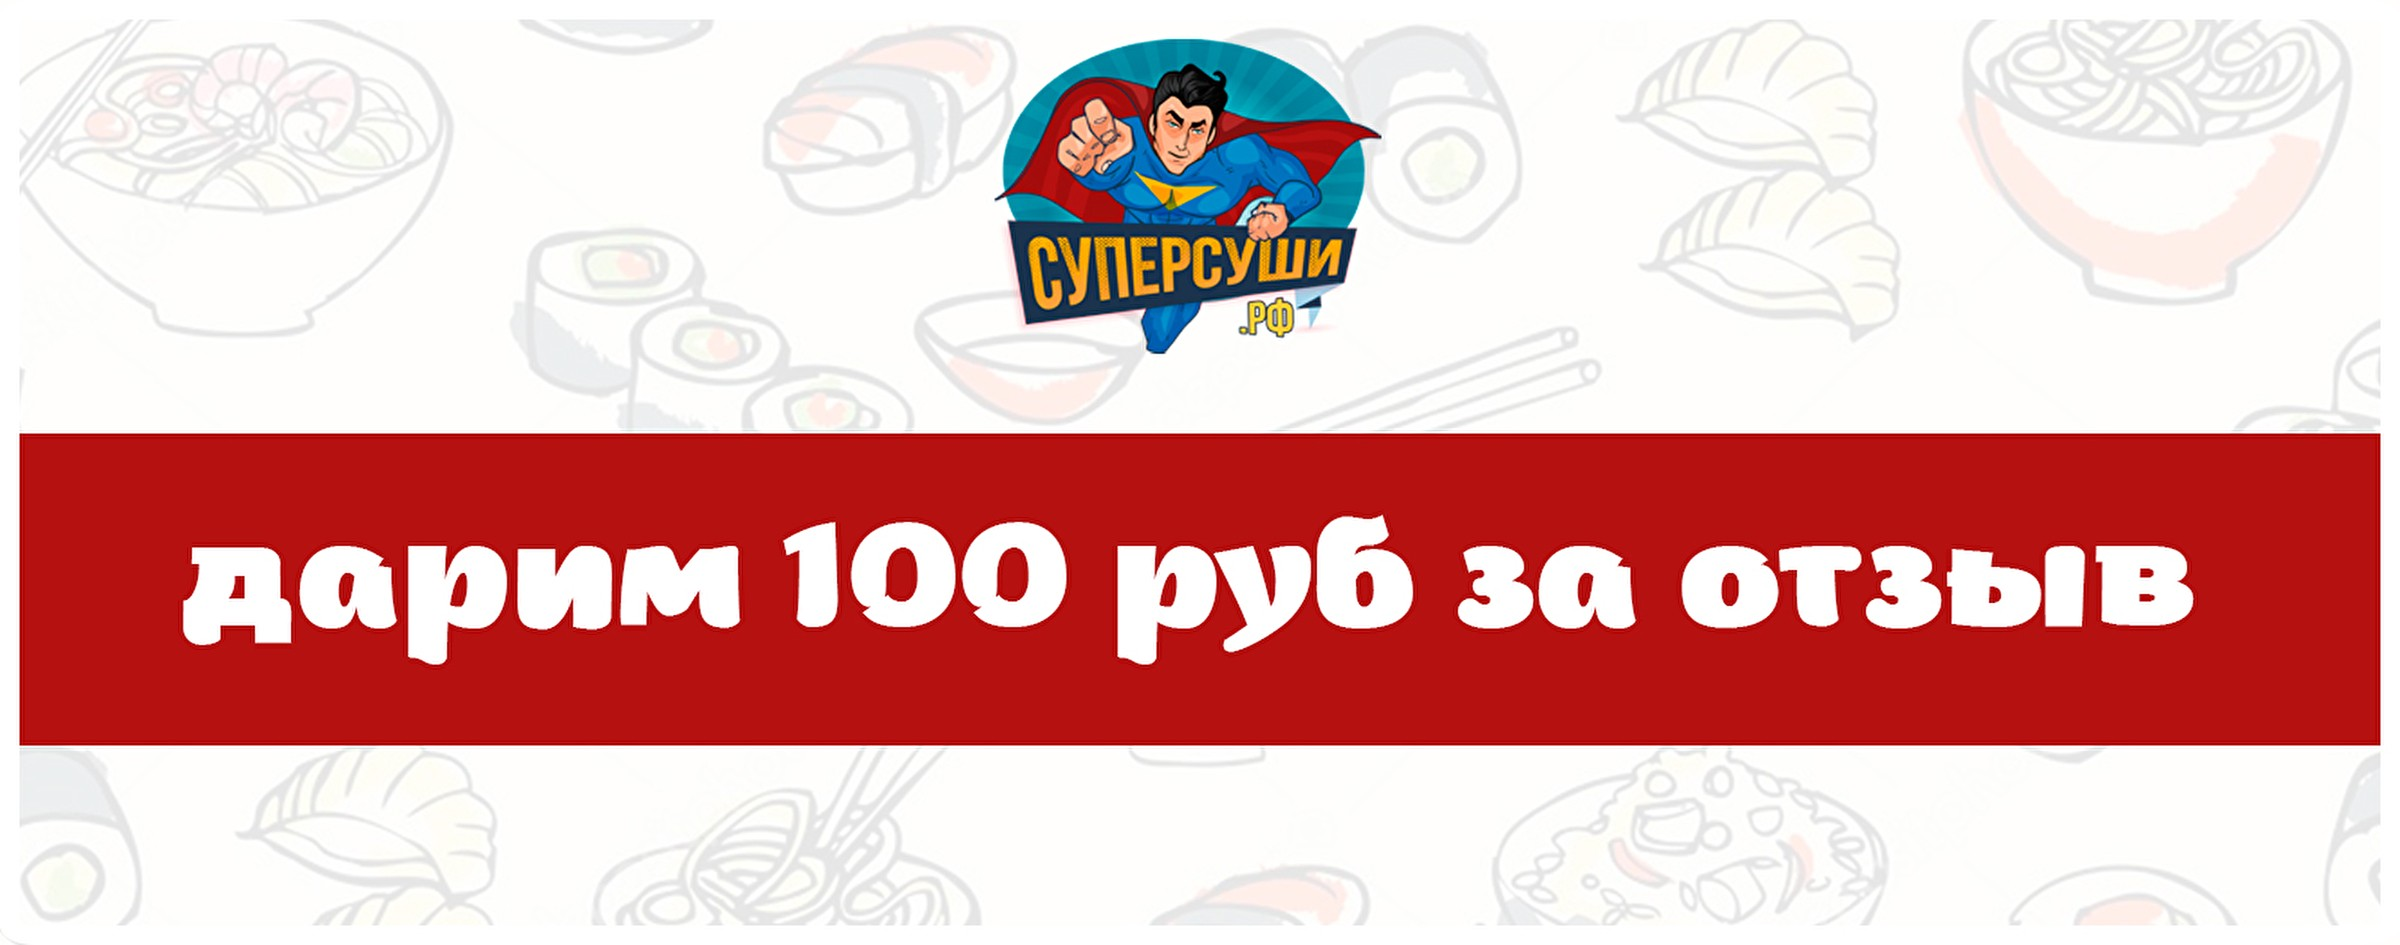 Дарим 100 рублей за отзыв!